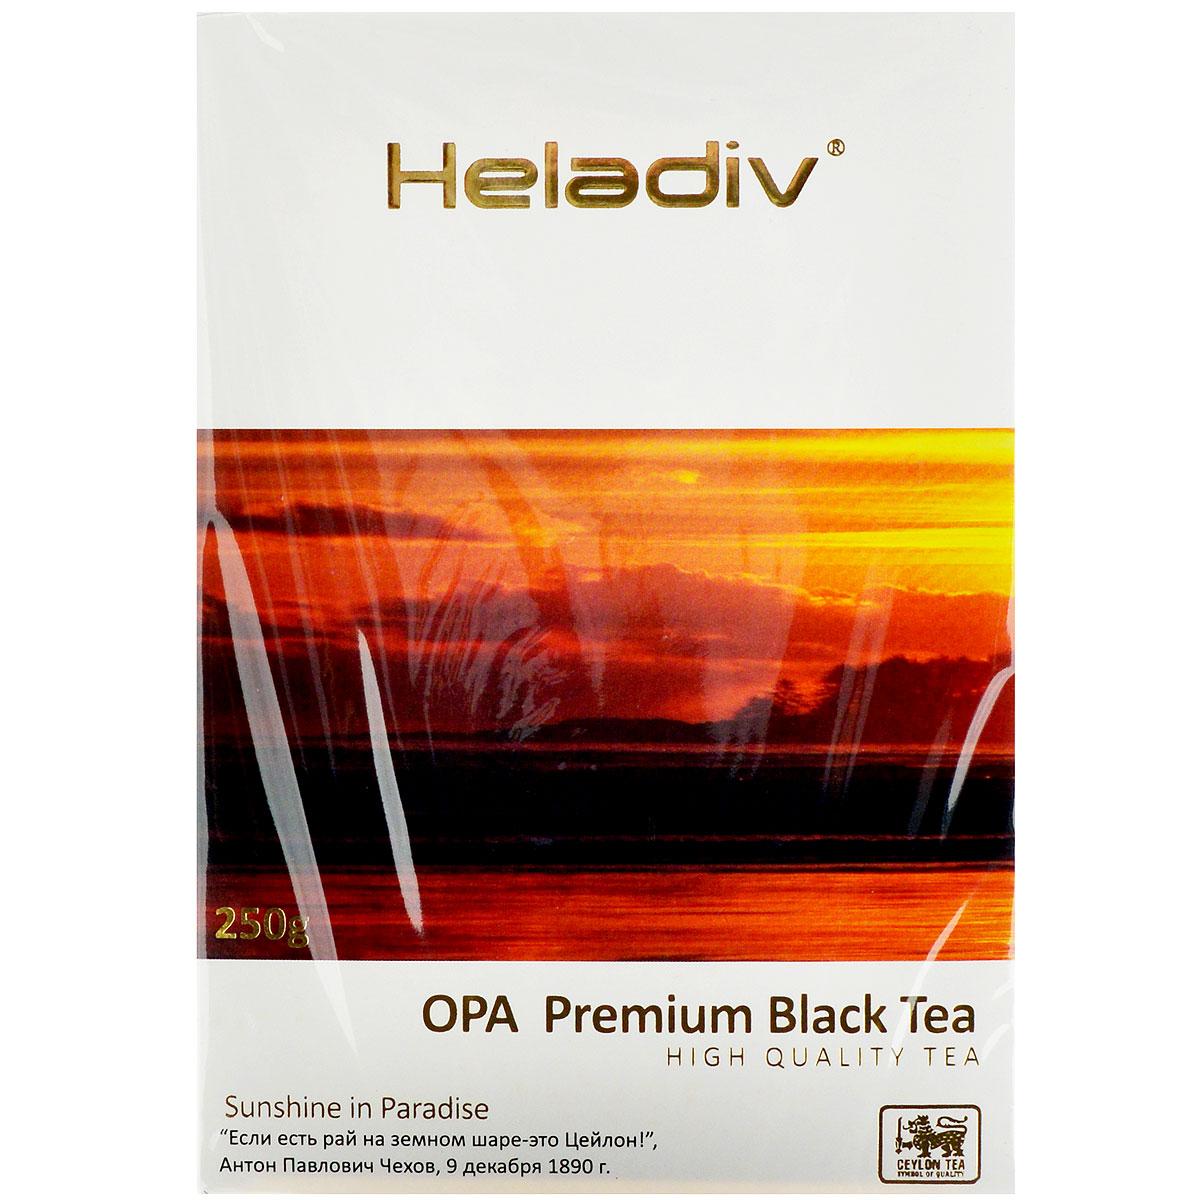 Heladiv Opa чай черный листовой, 250 г чай heladiv чай черный листовой heladiv pekoe 400г